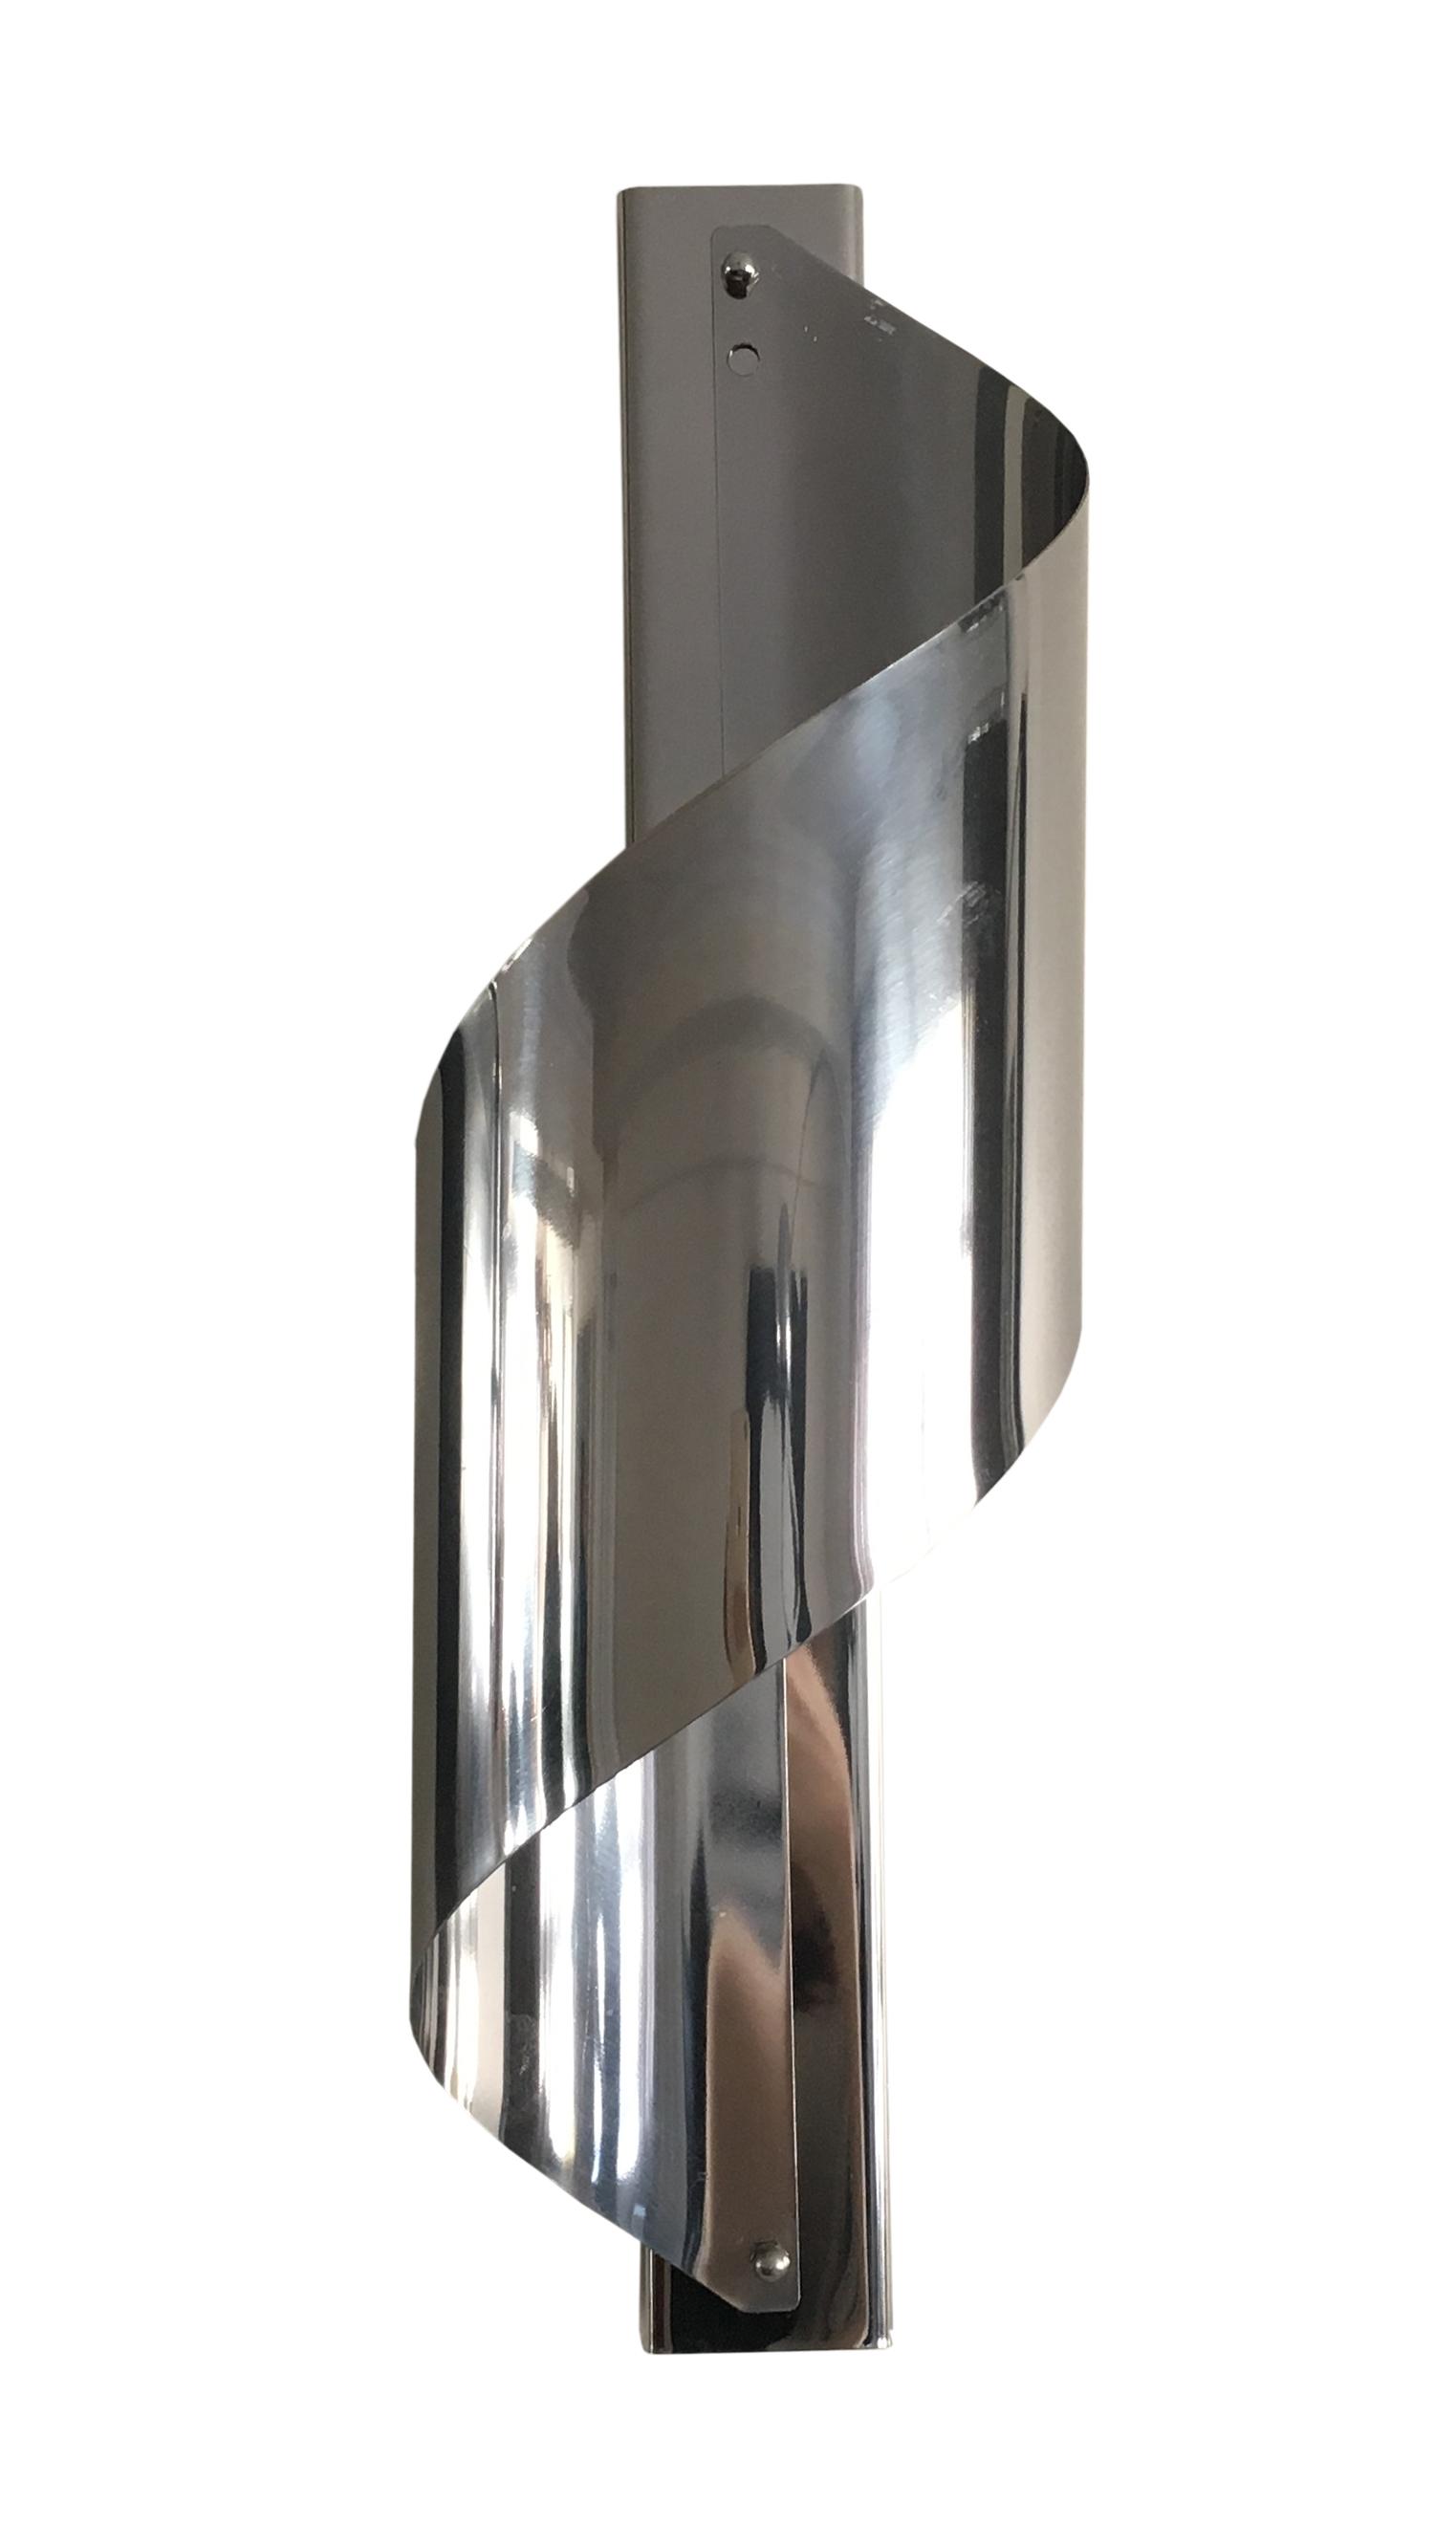 Mid-Century Chrome Spiral Wall Sconces - A Pair Chairish